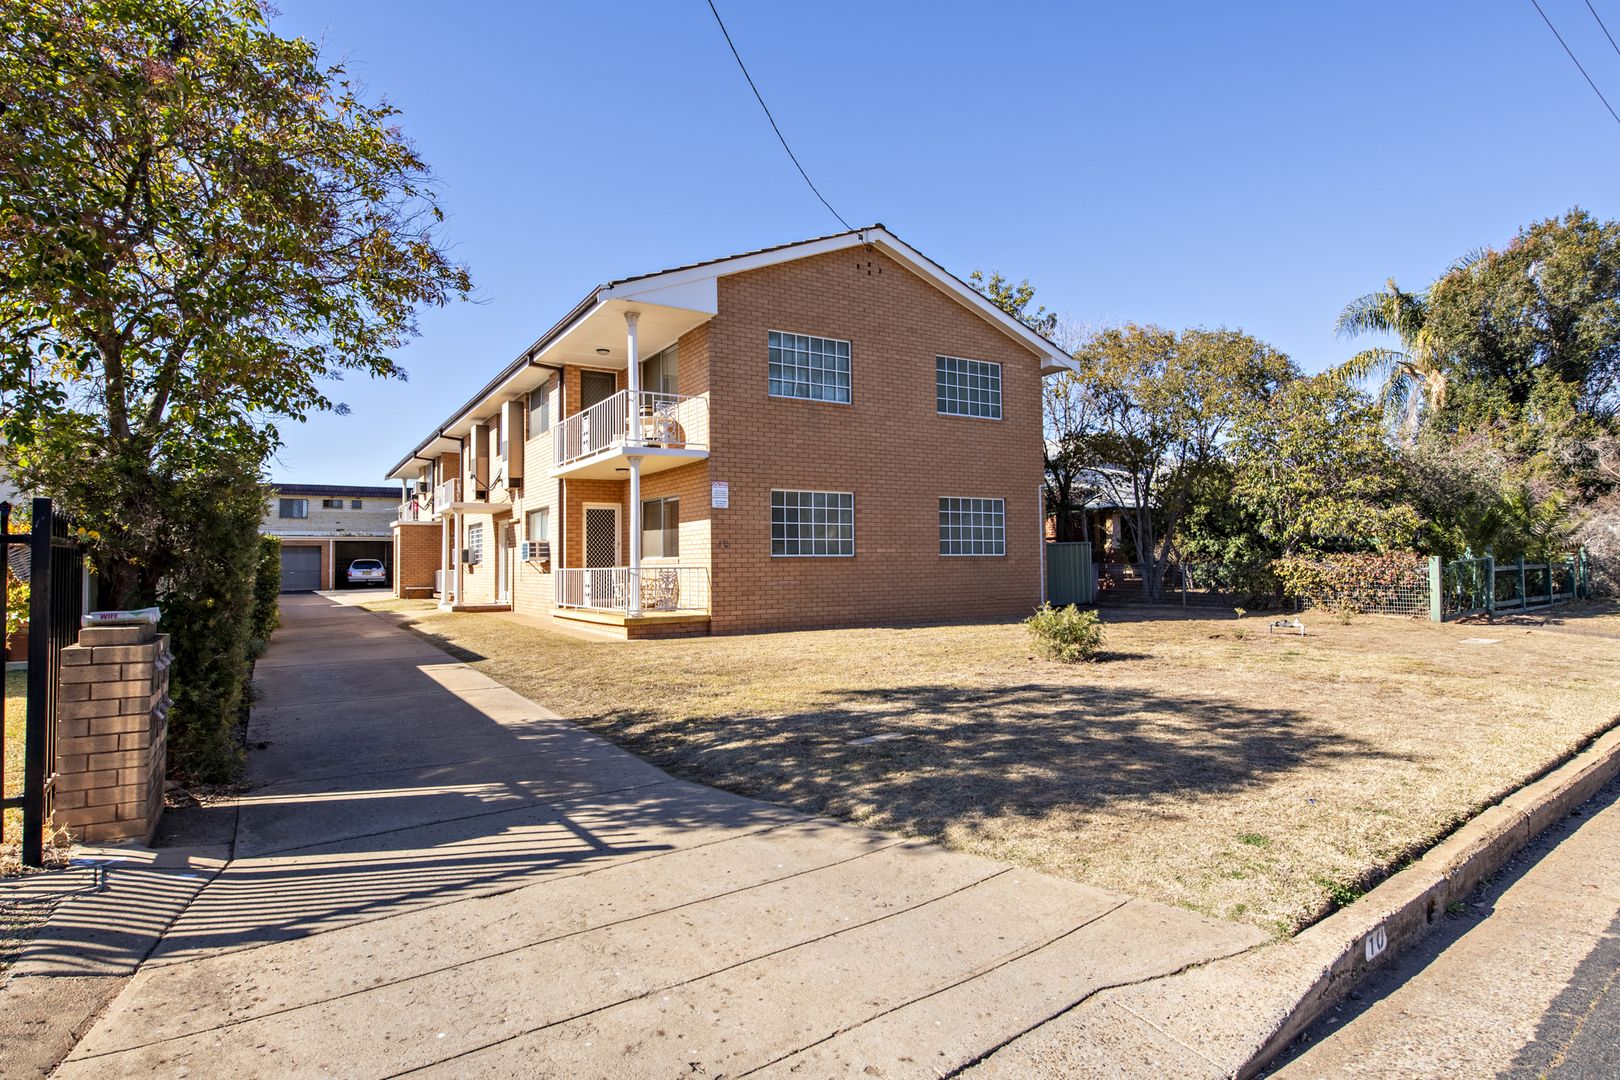 2/10 Smith Street, Dubbo NSW 2830, Image 0